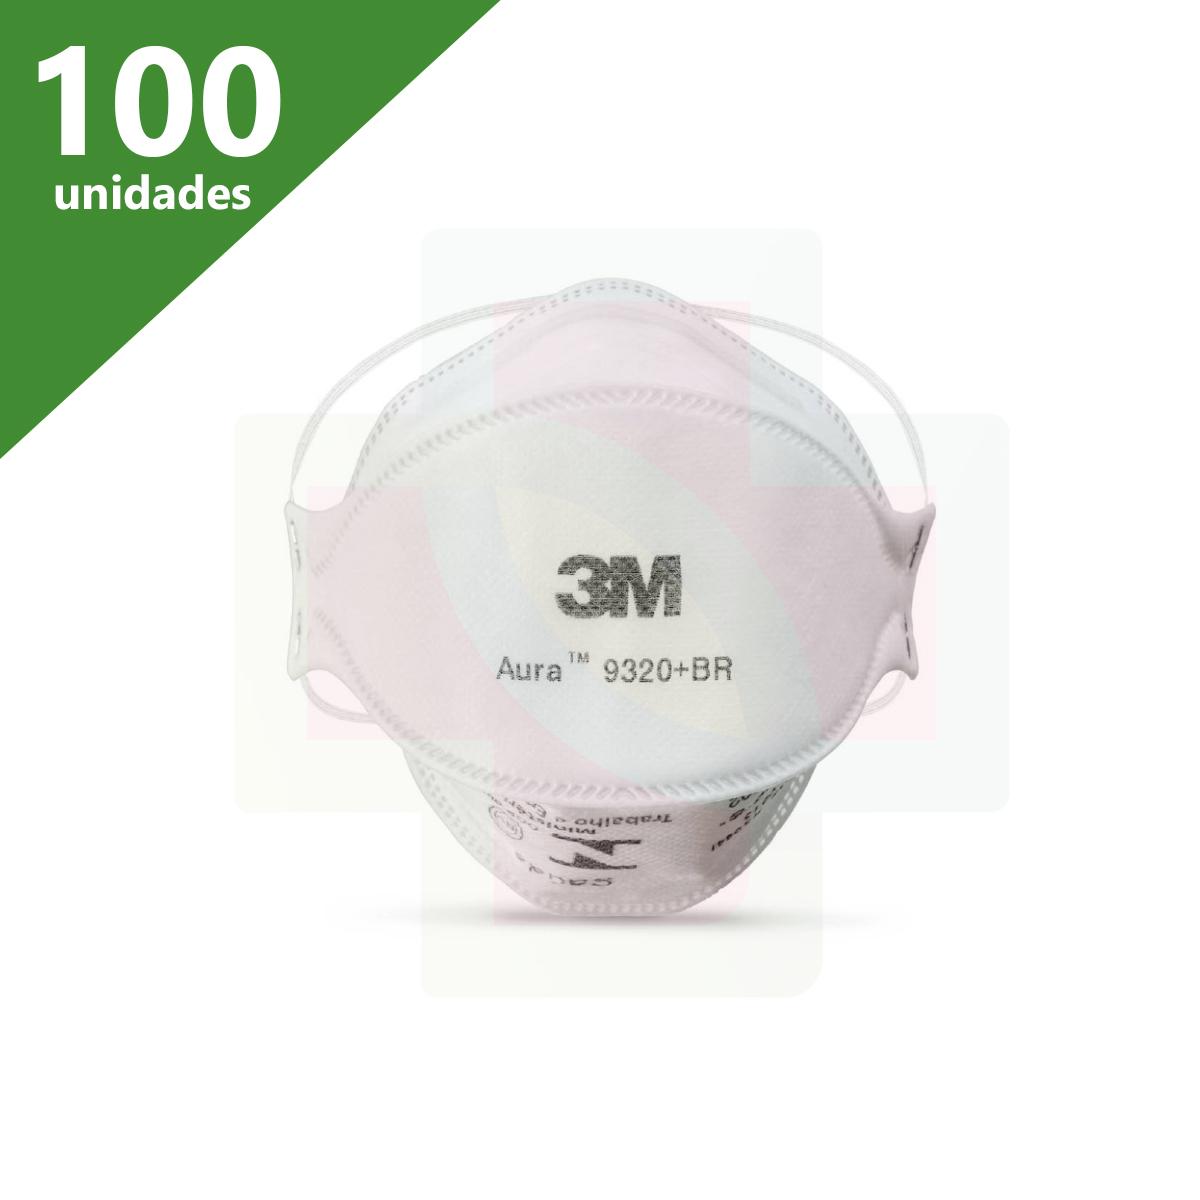 MÁSCARA DE PROTEÇÃO PFF2 AURA 9320+BR (KIT C/100) - 3M